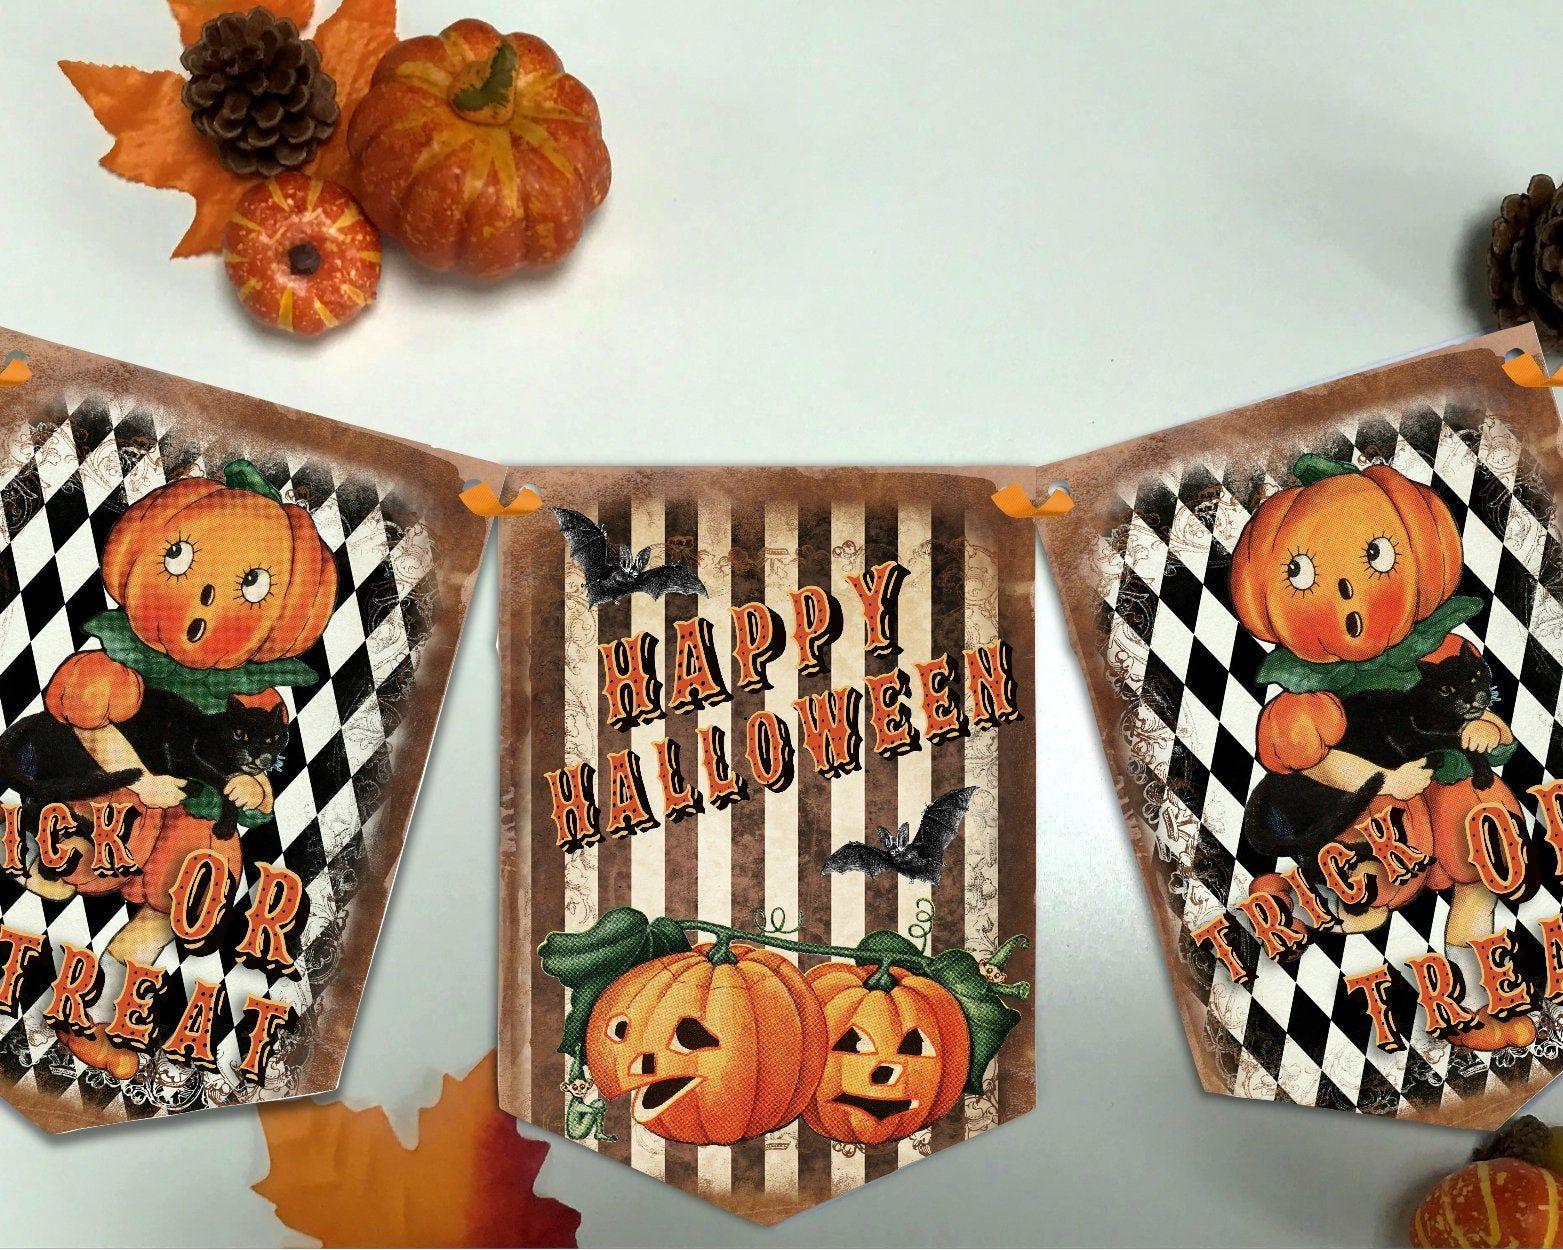 Halloween Banner Retro Pumpkin Bunting Halloween Banner Etsy In 2020 Halloween Banner Vintage Halloween Party Halloween Decorations